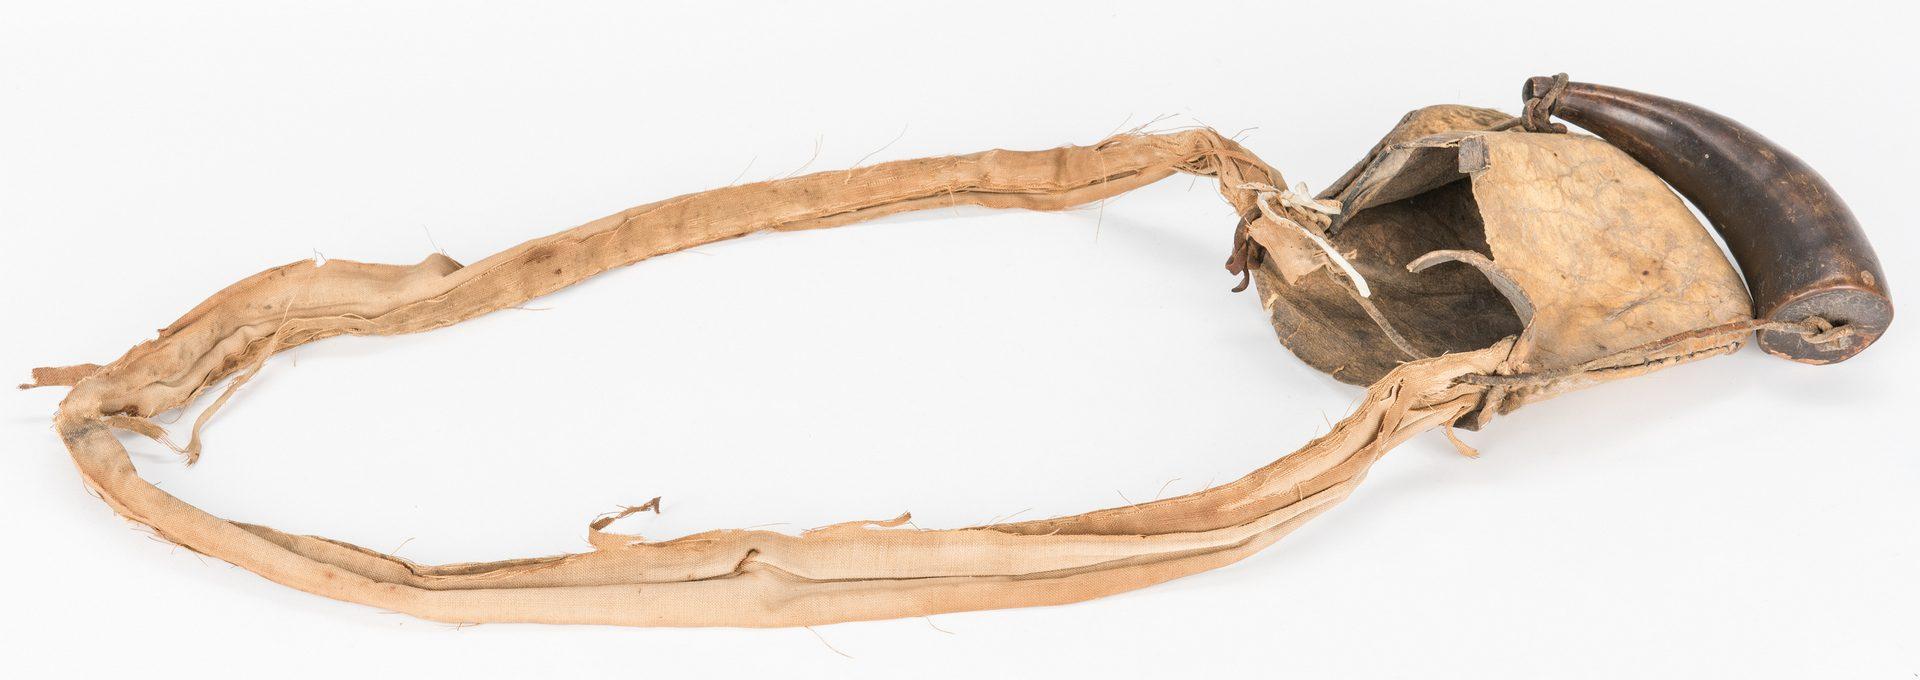 Lot 182: 3 Powder Horns w/ Bags & Spyglass, 6 items